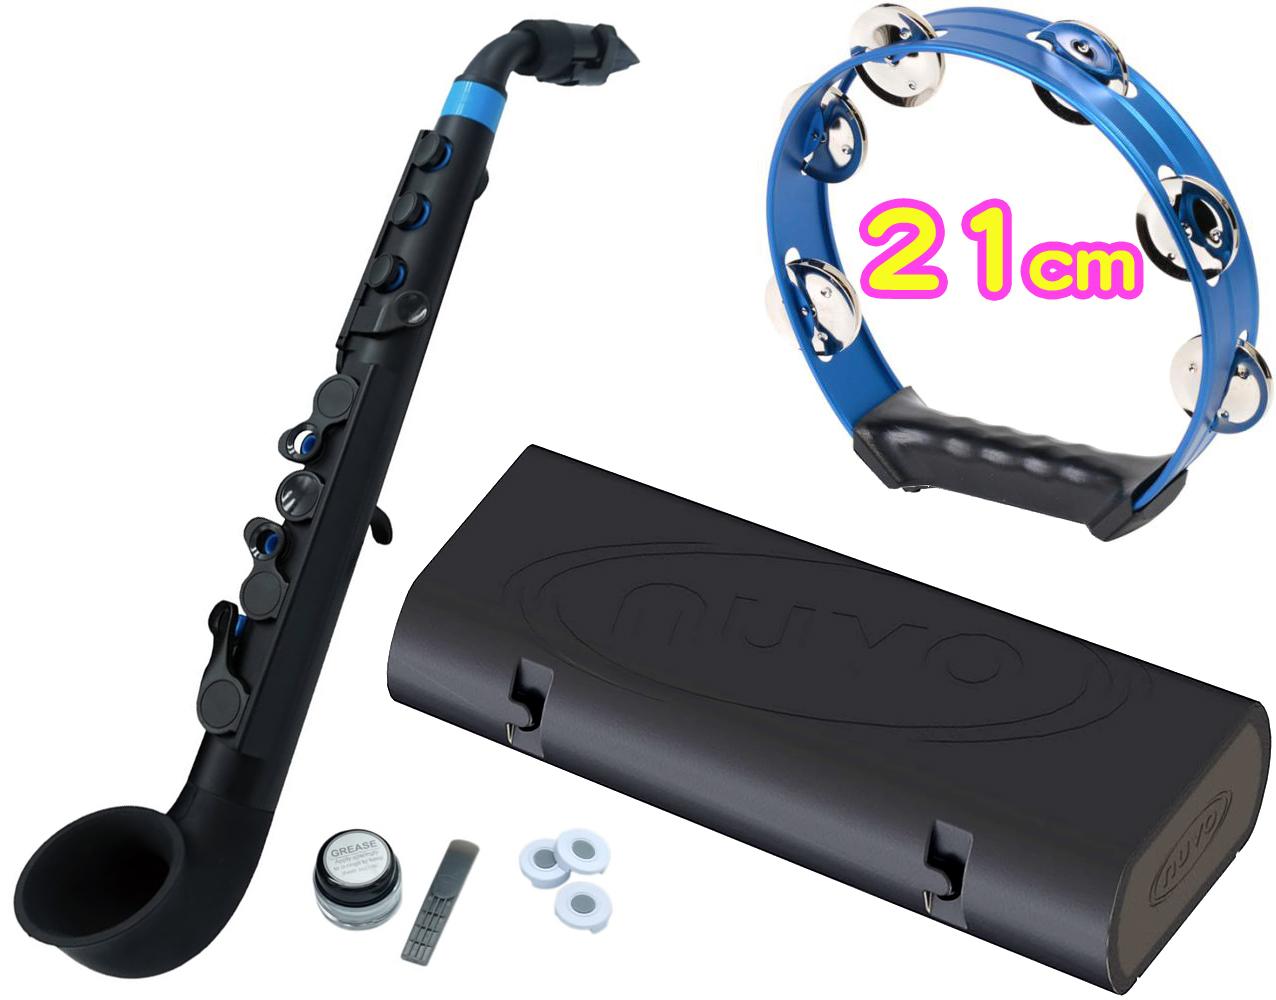 BK/BL ( サクソフォン jSAX 黒色 ブラック ブルー ) NUVO 本体 送料無料 セット 青色 E】 Blue N510JBBL 水色 リード楽器 サックス ヌーボ jサックス 管楽器 プラスチック製 【